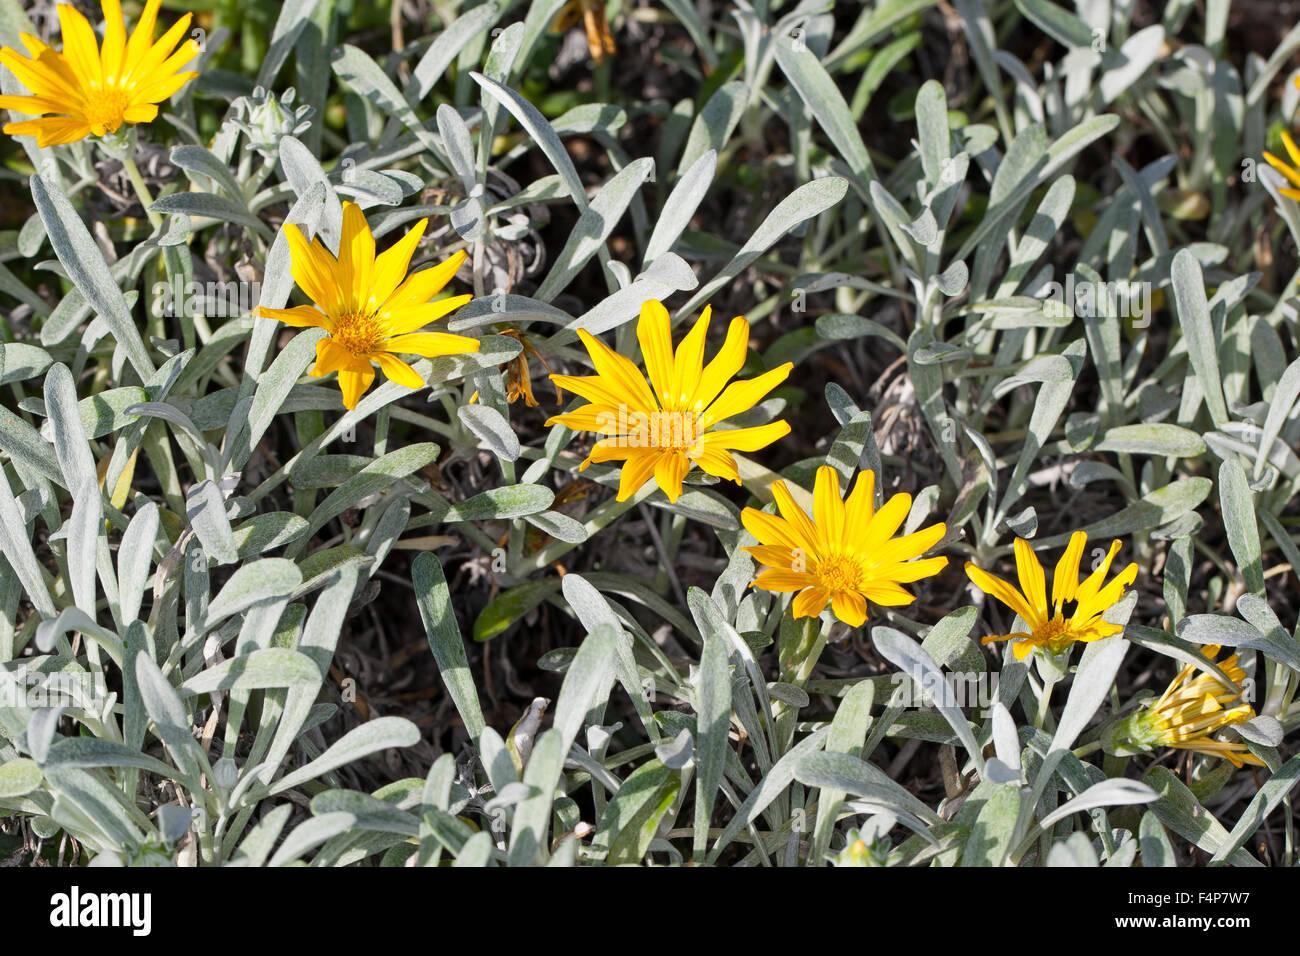 Treasureflower, Treasure-flower, Treasure flower, Gazanie, Mittagsgold, Mittagsgoldblume, Gazania krebsiana, Gazania - Stock Image